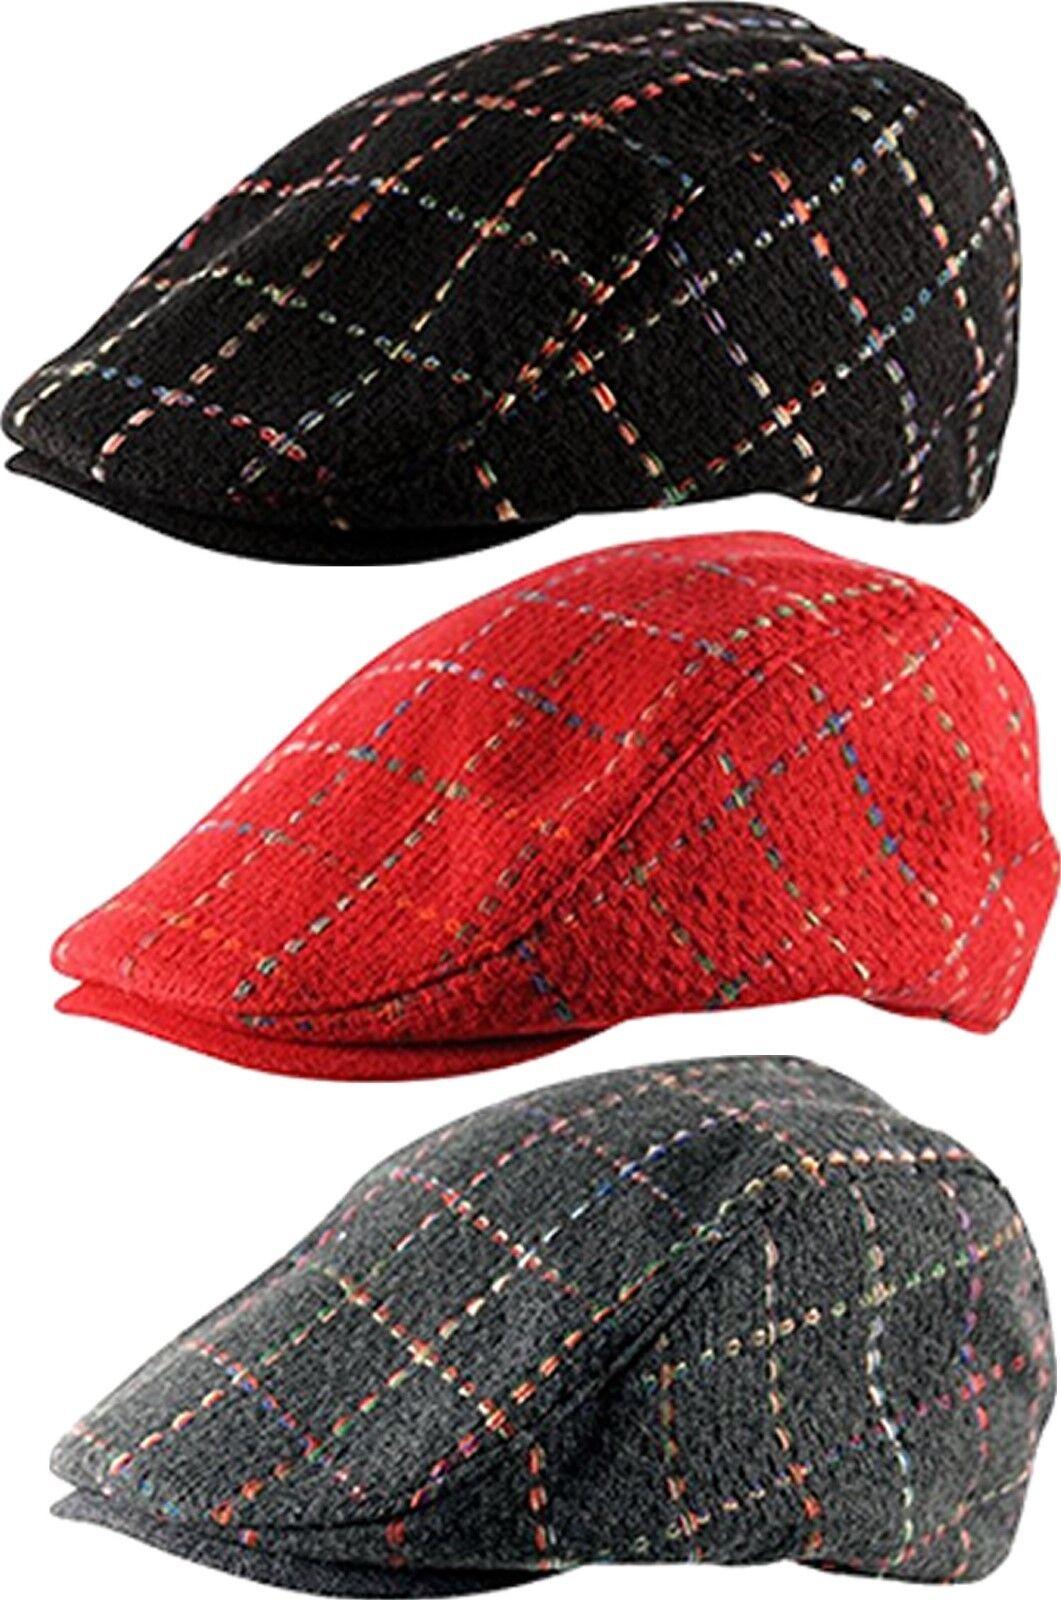 Woven Saddle Check Cabbie Country Golf Gatsby Newsboy Hat Baker Boy Flat Cap Hat Newsboy eafe98